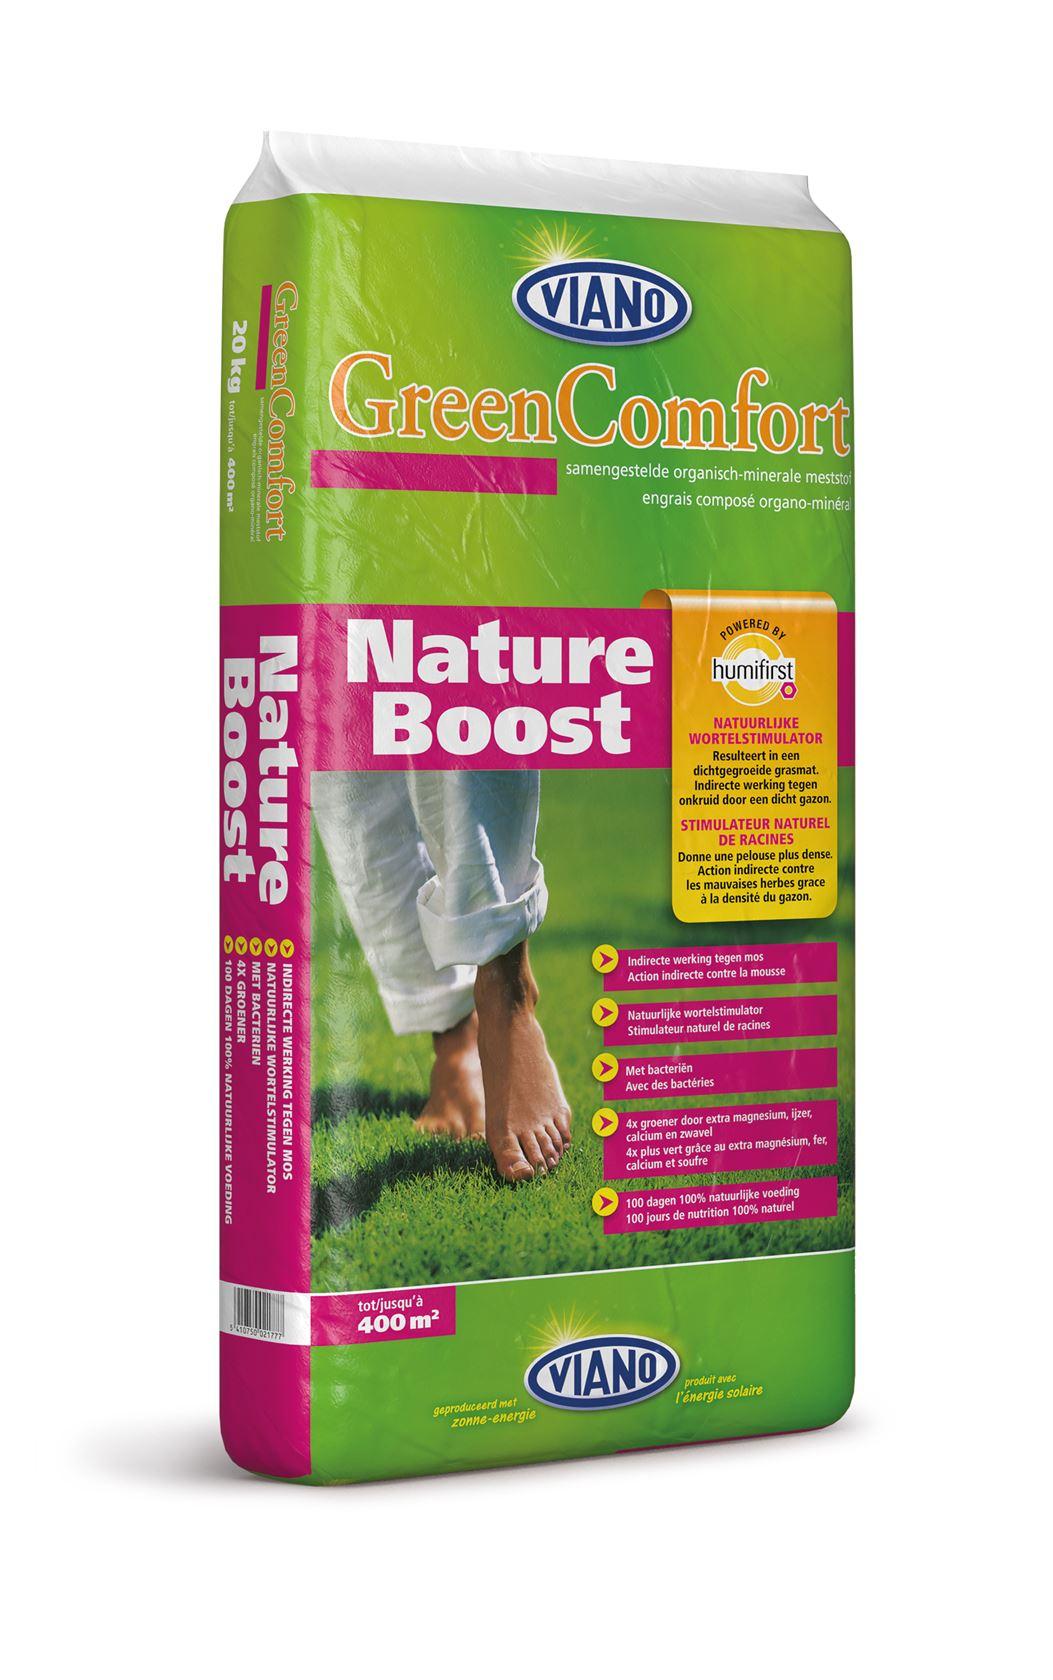 Natureboost-gazonmeststof-humifirst-20kg-voor-400-m-